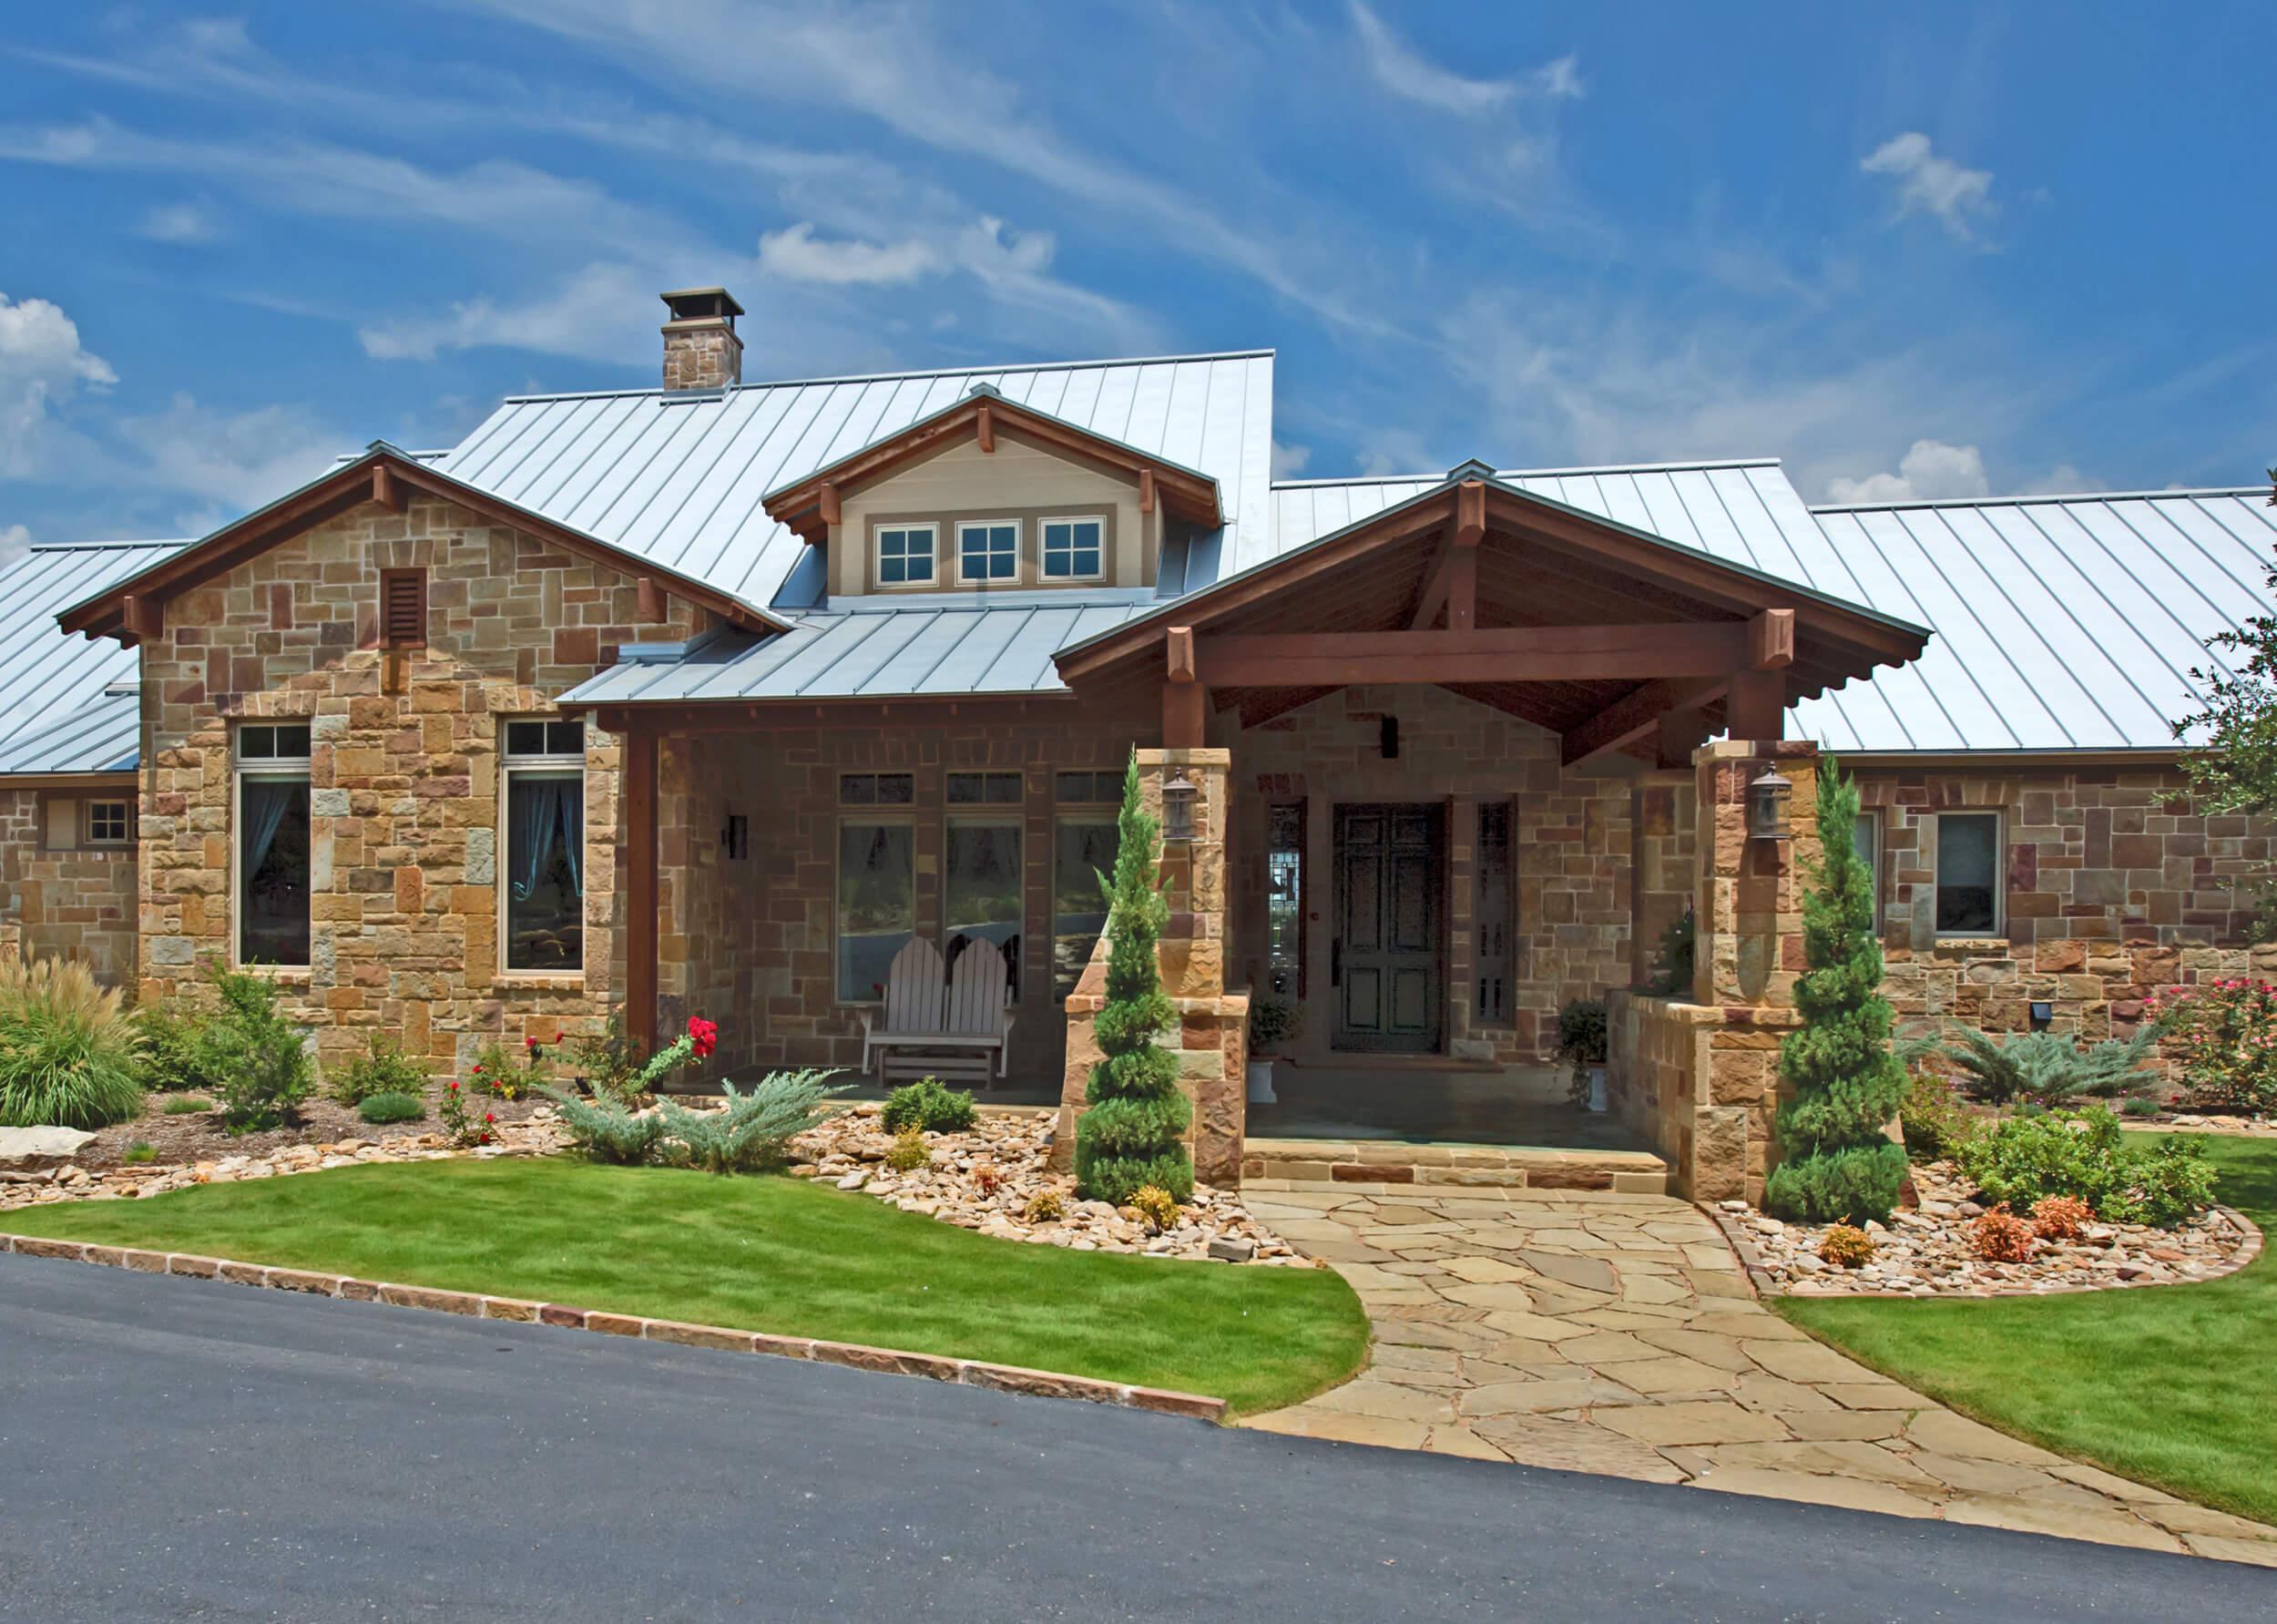 Steve Bumpas Custom Homes Ridgeview 03 Homebuilder Remodel Granbury Brazos Bend Cresson DeCordova Pecan Plantation Tolar Glen Rose Fort Worth.jpg